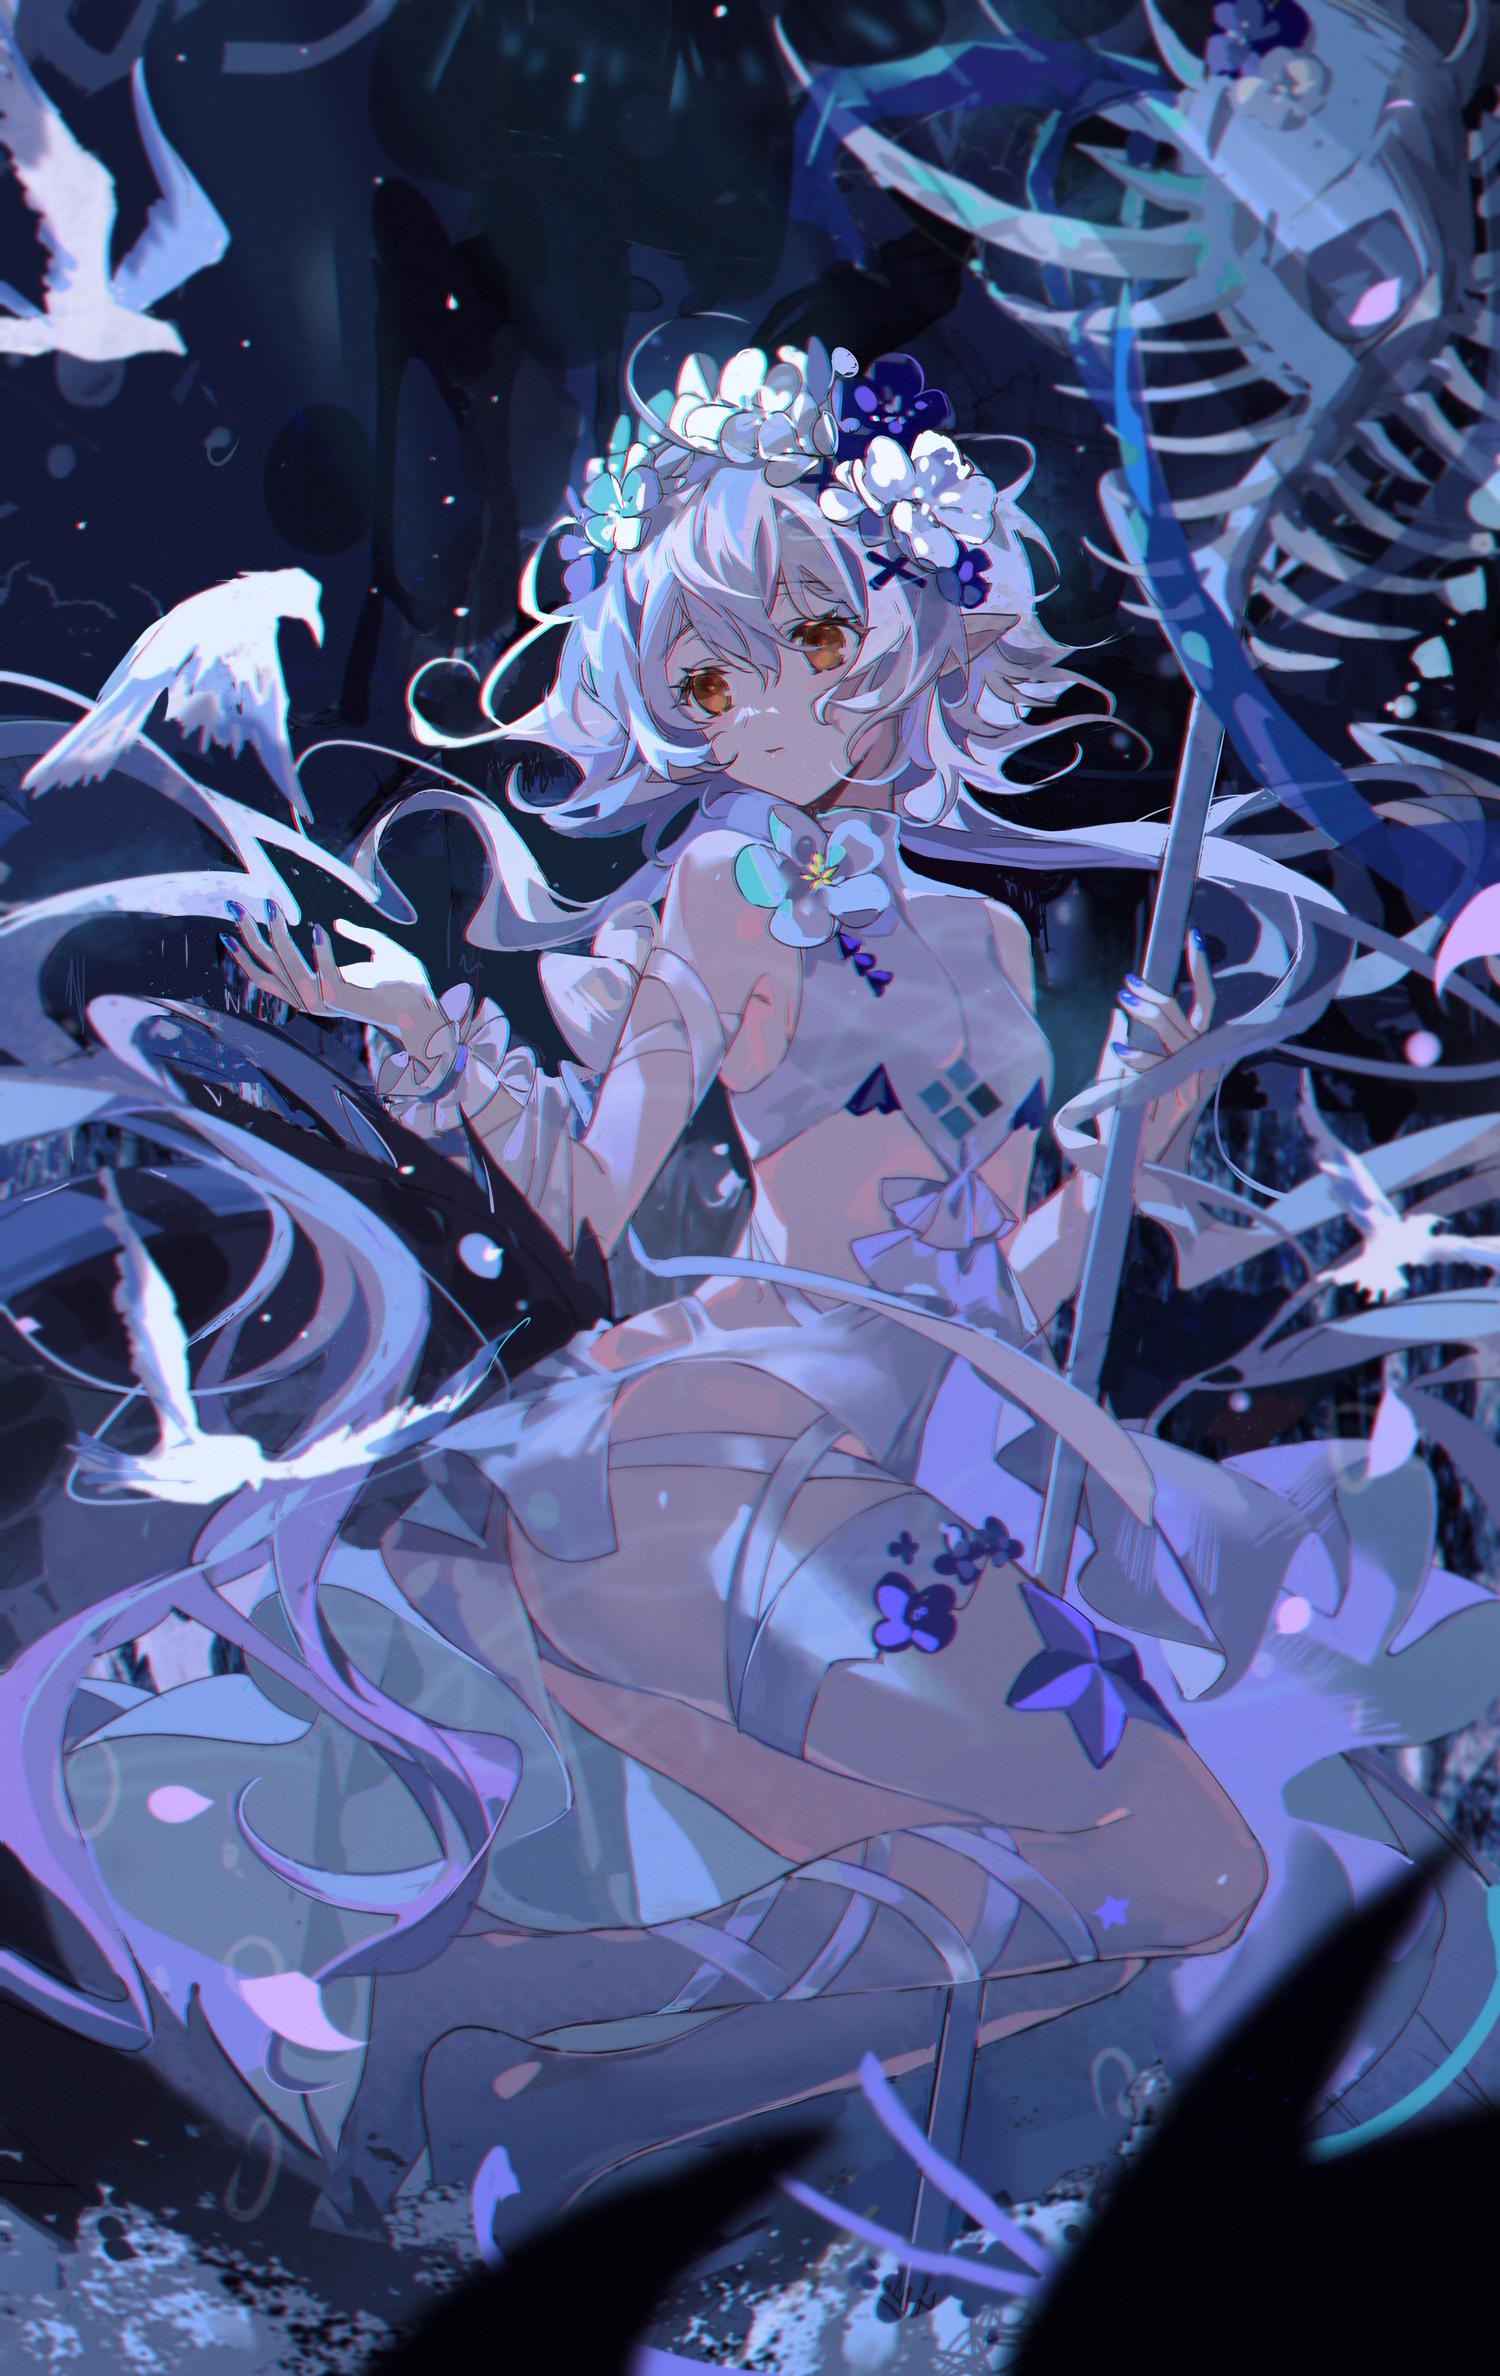 Anime 1500x2376 anime anime girls KANOSE Arknights